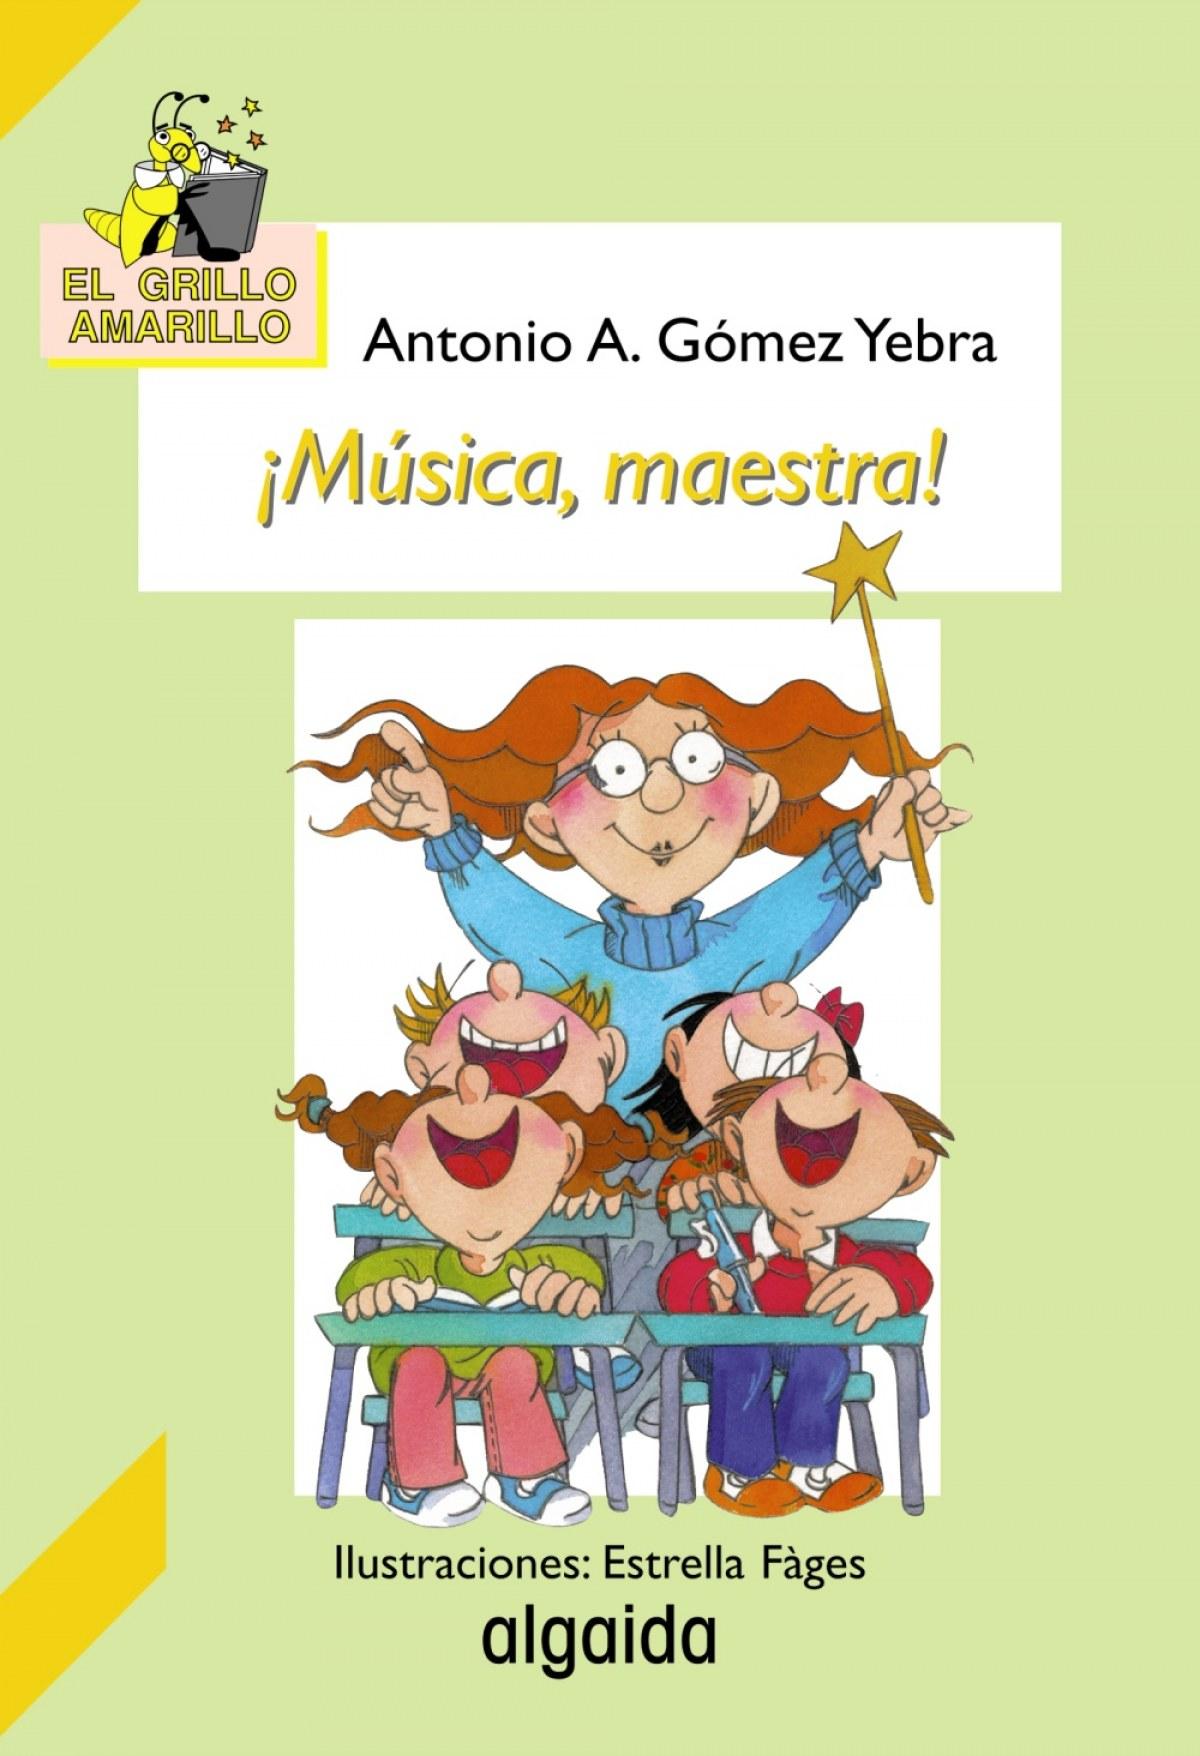 ¡Música, maestra!